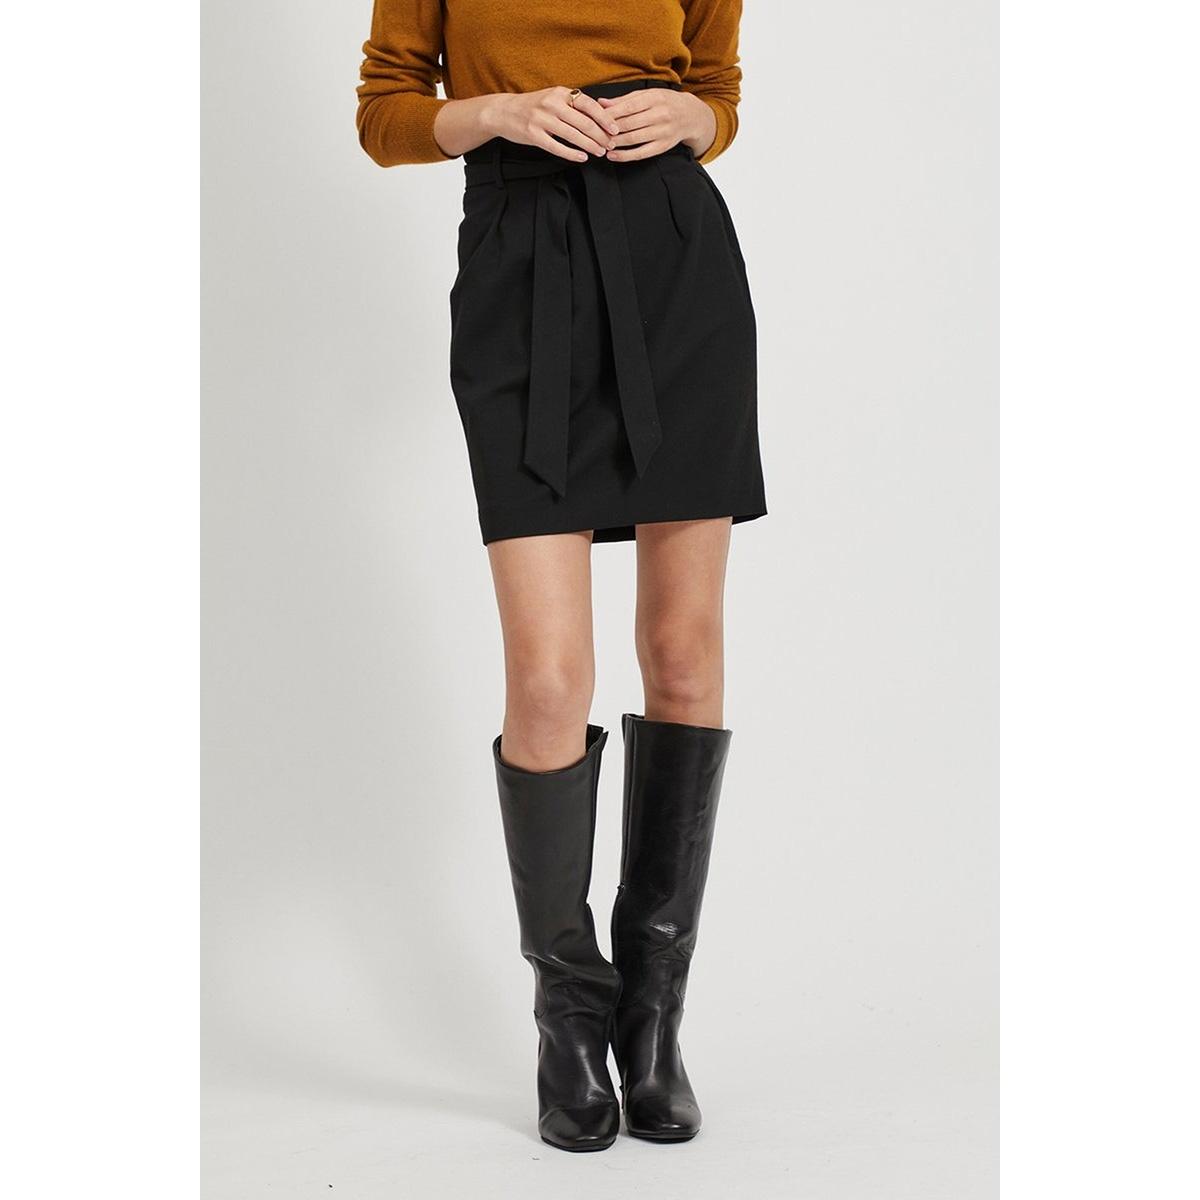 objlisa abella mini skirt noos 23030173 object rok black